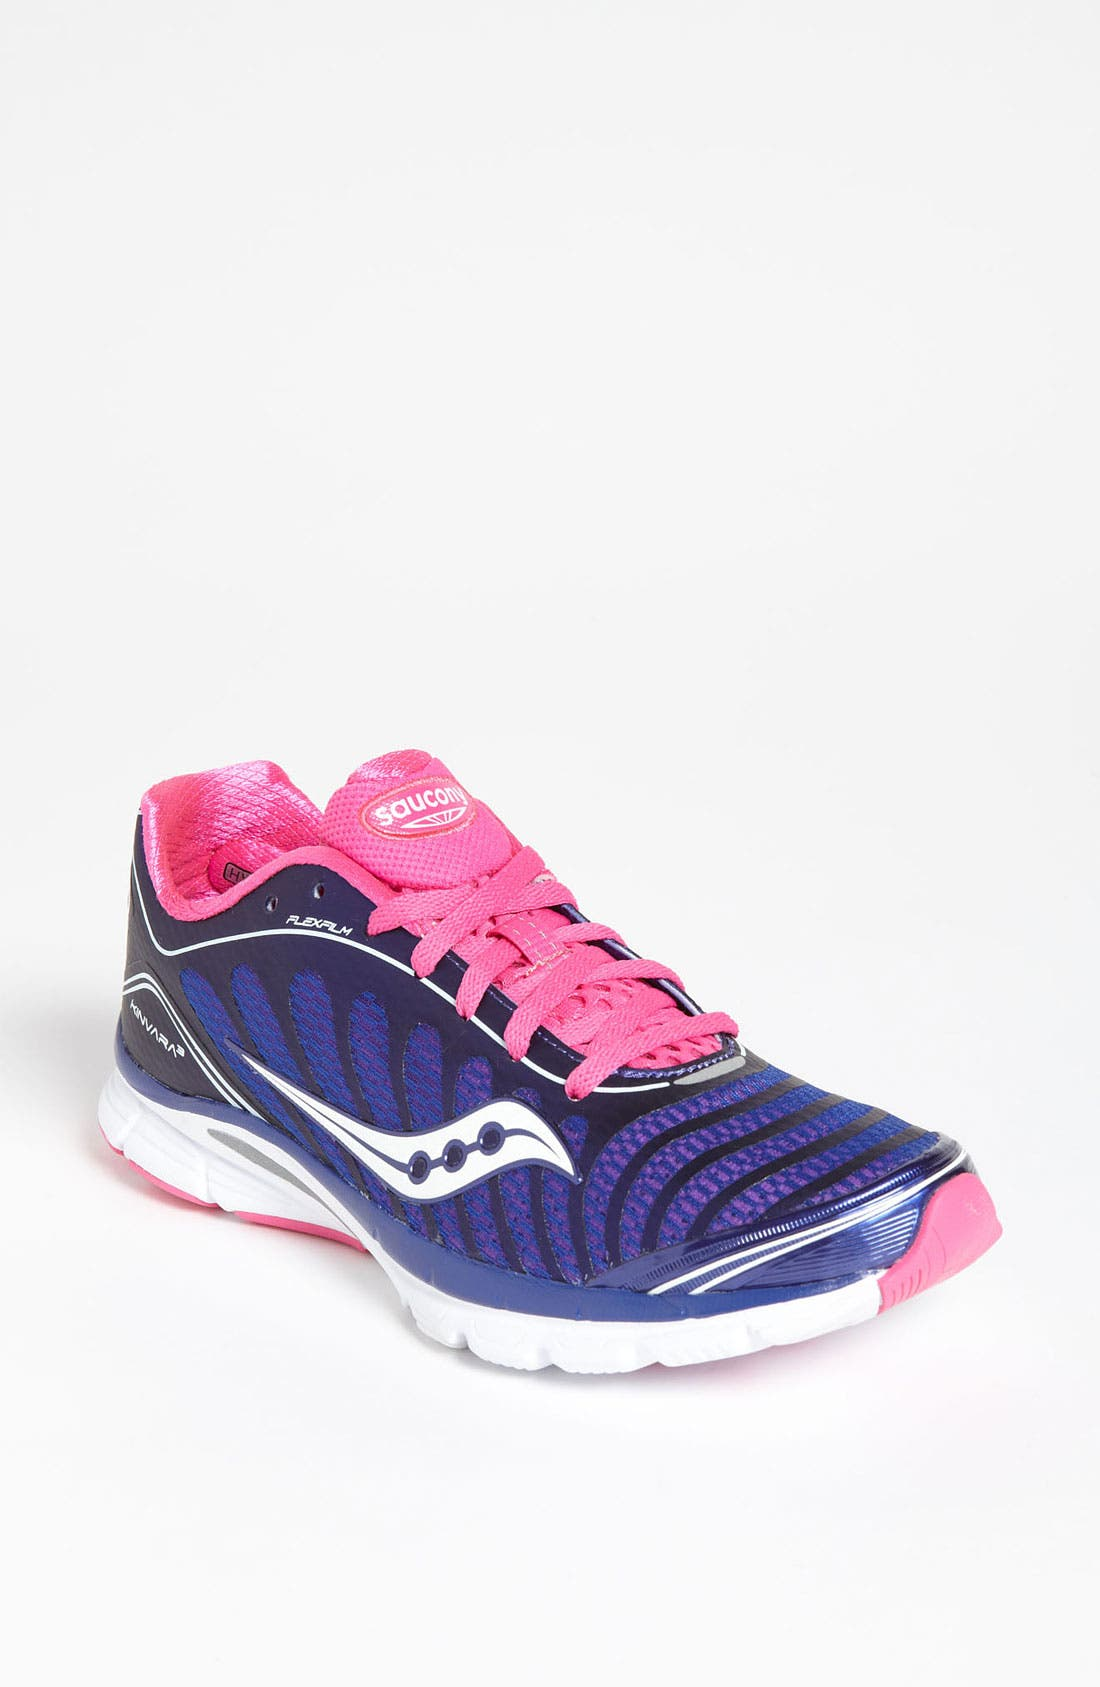 Alternate Image 1 Selected - Saucony 'ProGrid Kinvara 3' Running Shoe (Women)